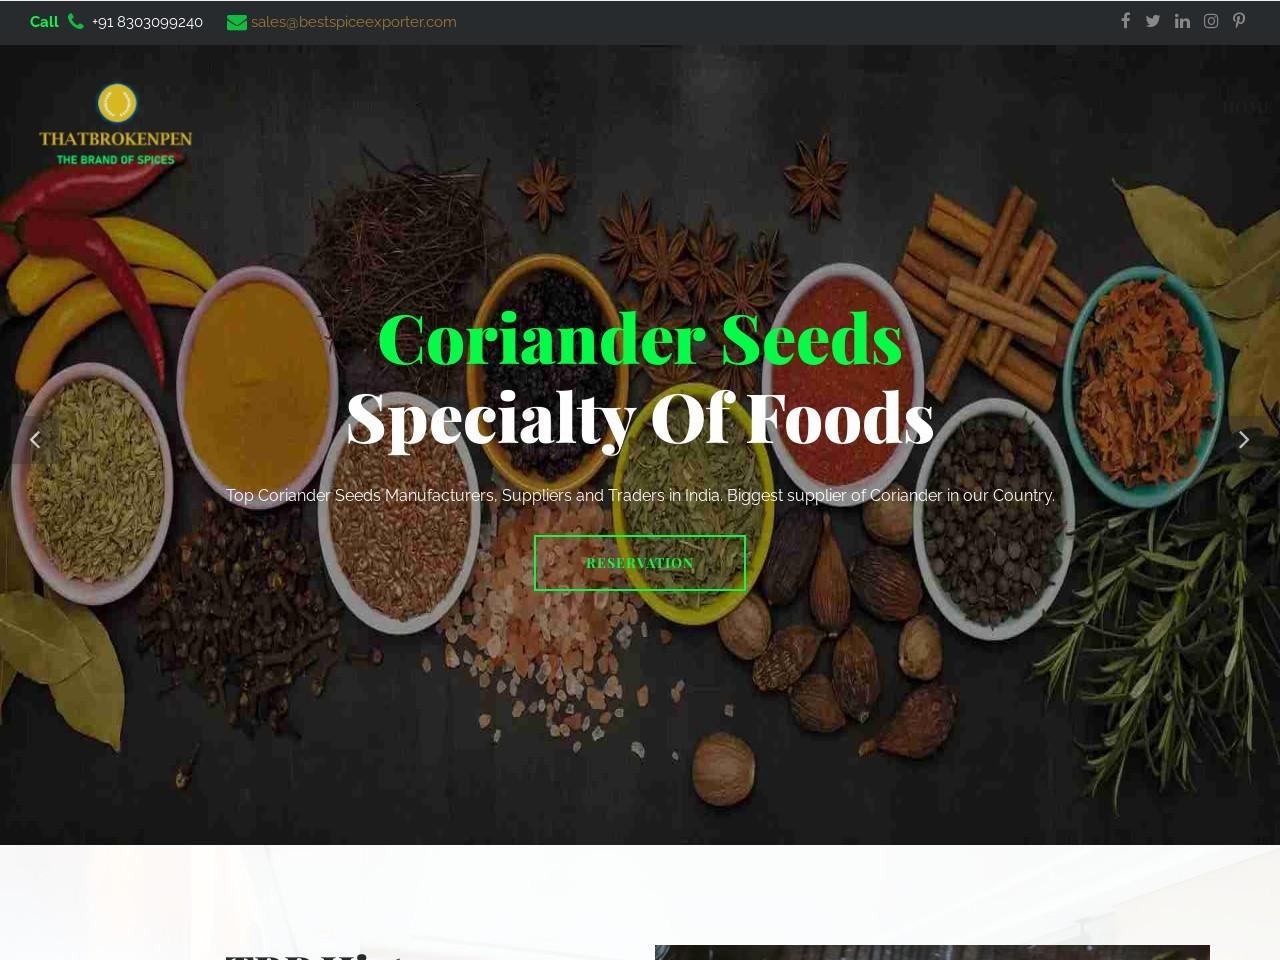 Top Organic Spice Manufacturer in India